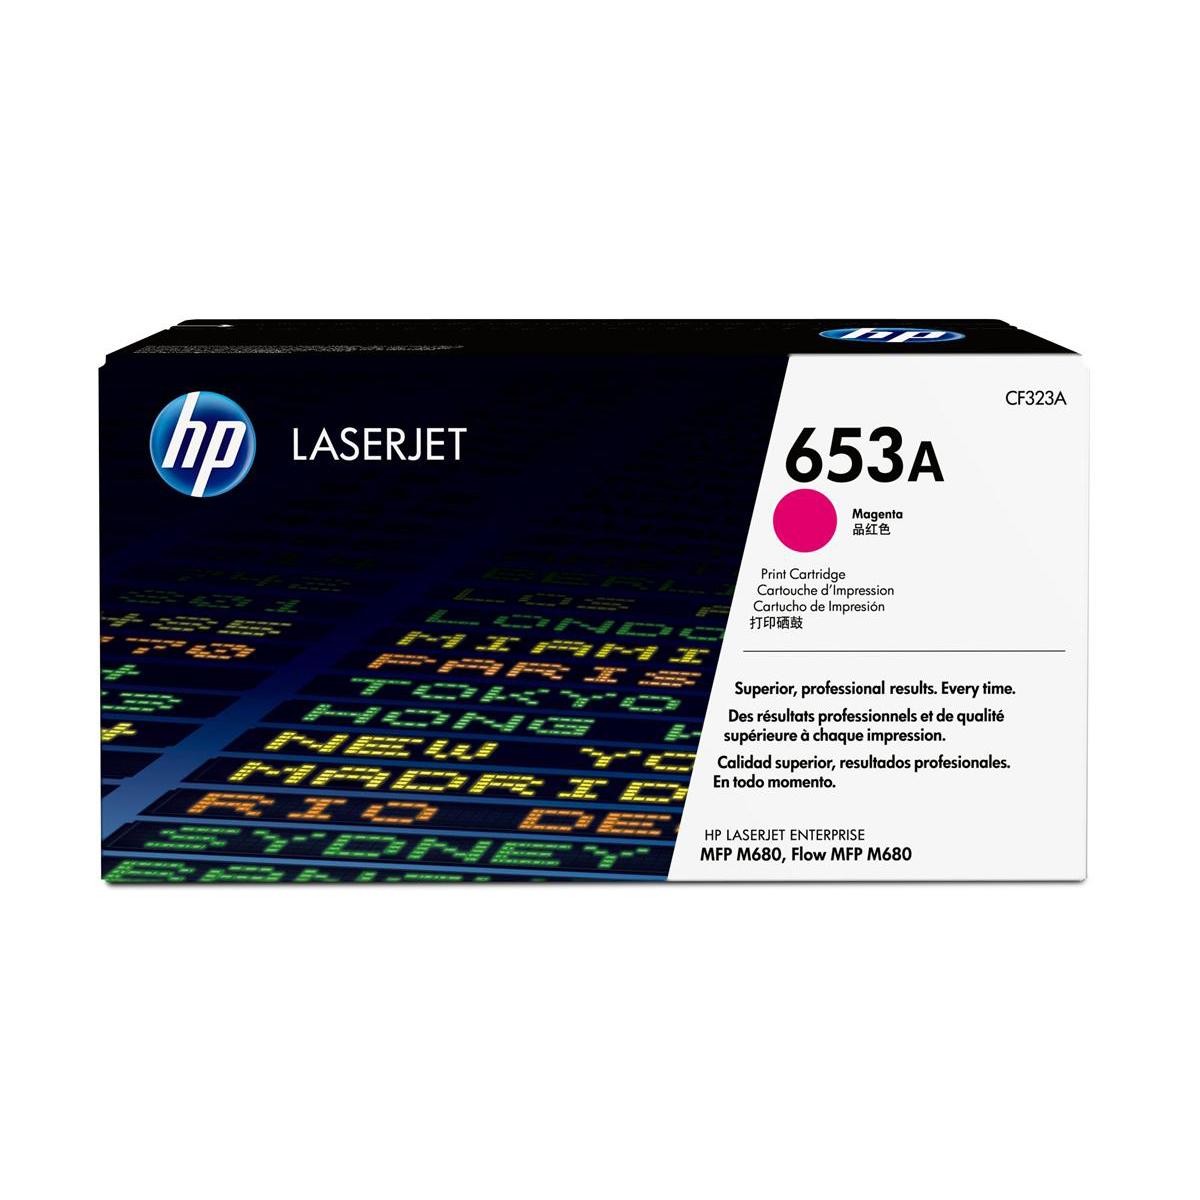 HP 653A Magenta Laserjet Toner Cartridge CF323A